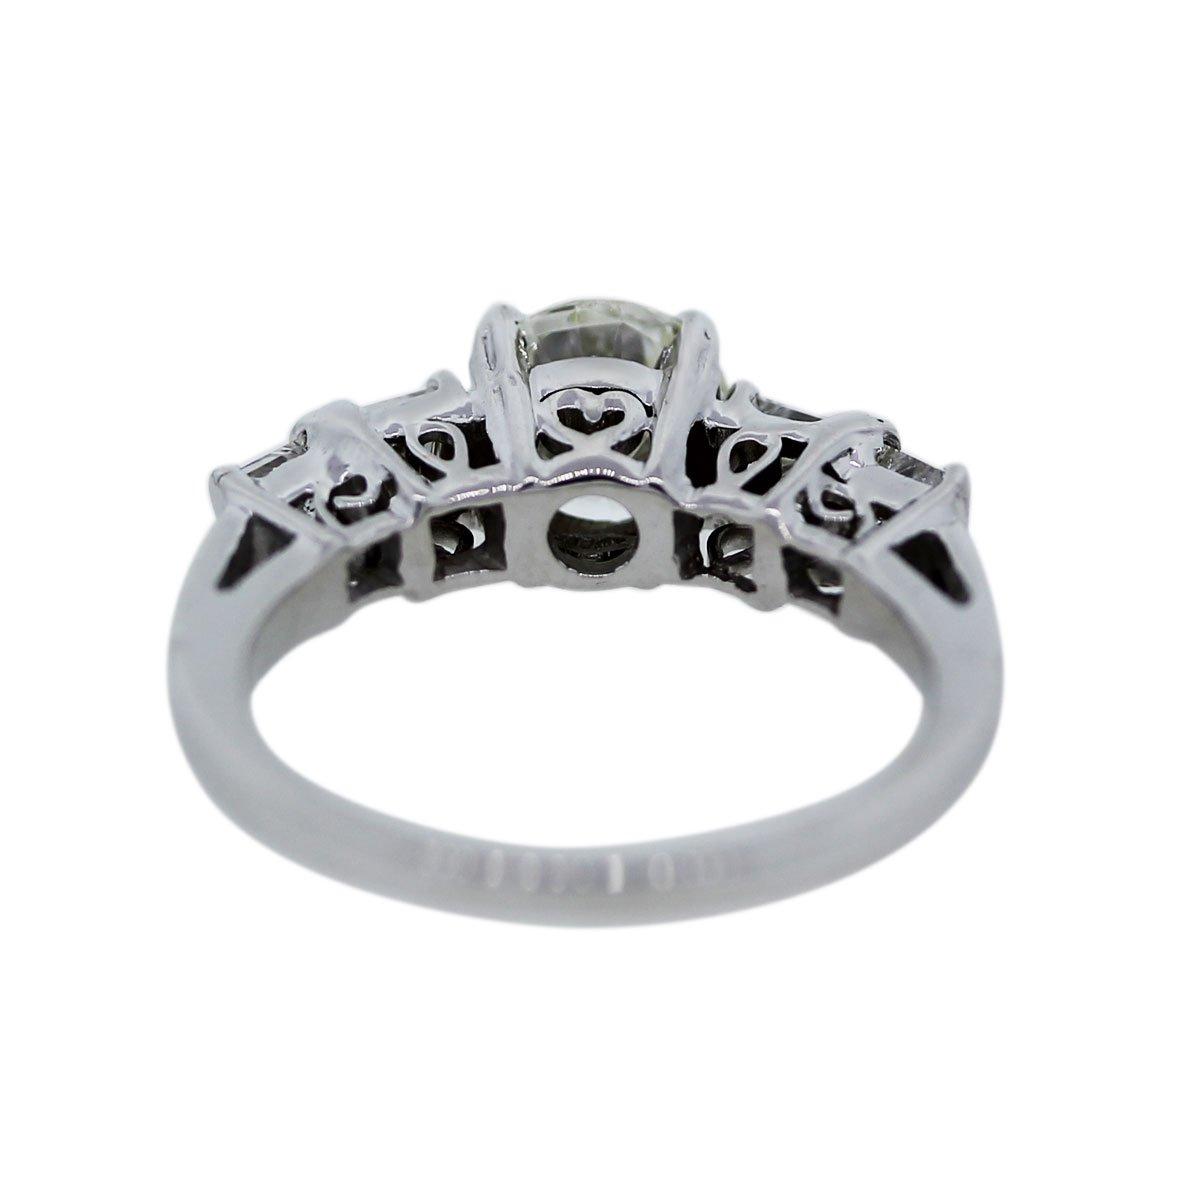 Wedding Ring His And Hers 93 Awesome Image via raymondleejewelers net